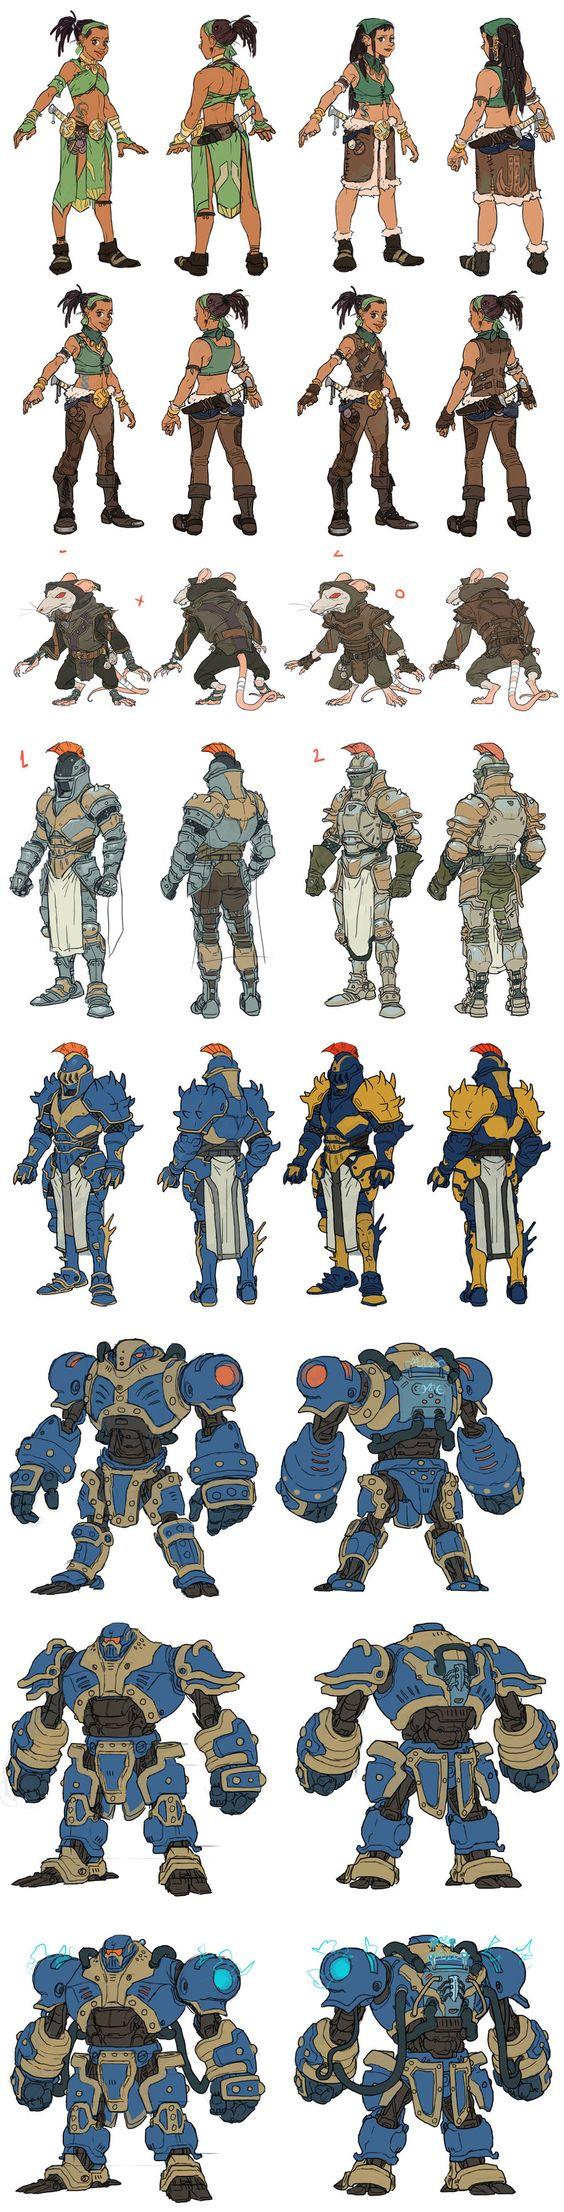 Concept Character Design Tutorials : G t e by pietro ant on deviantart concept art project